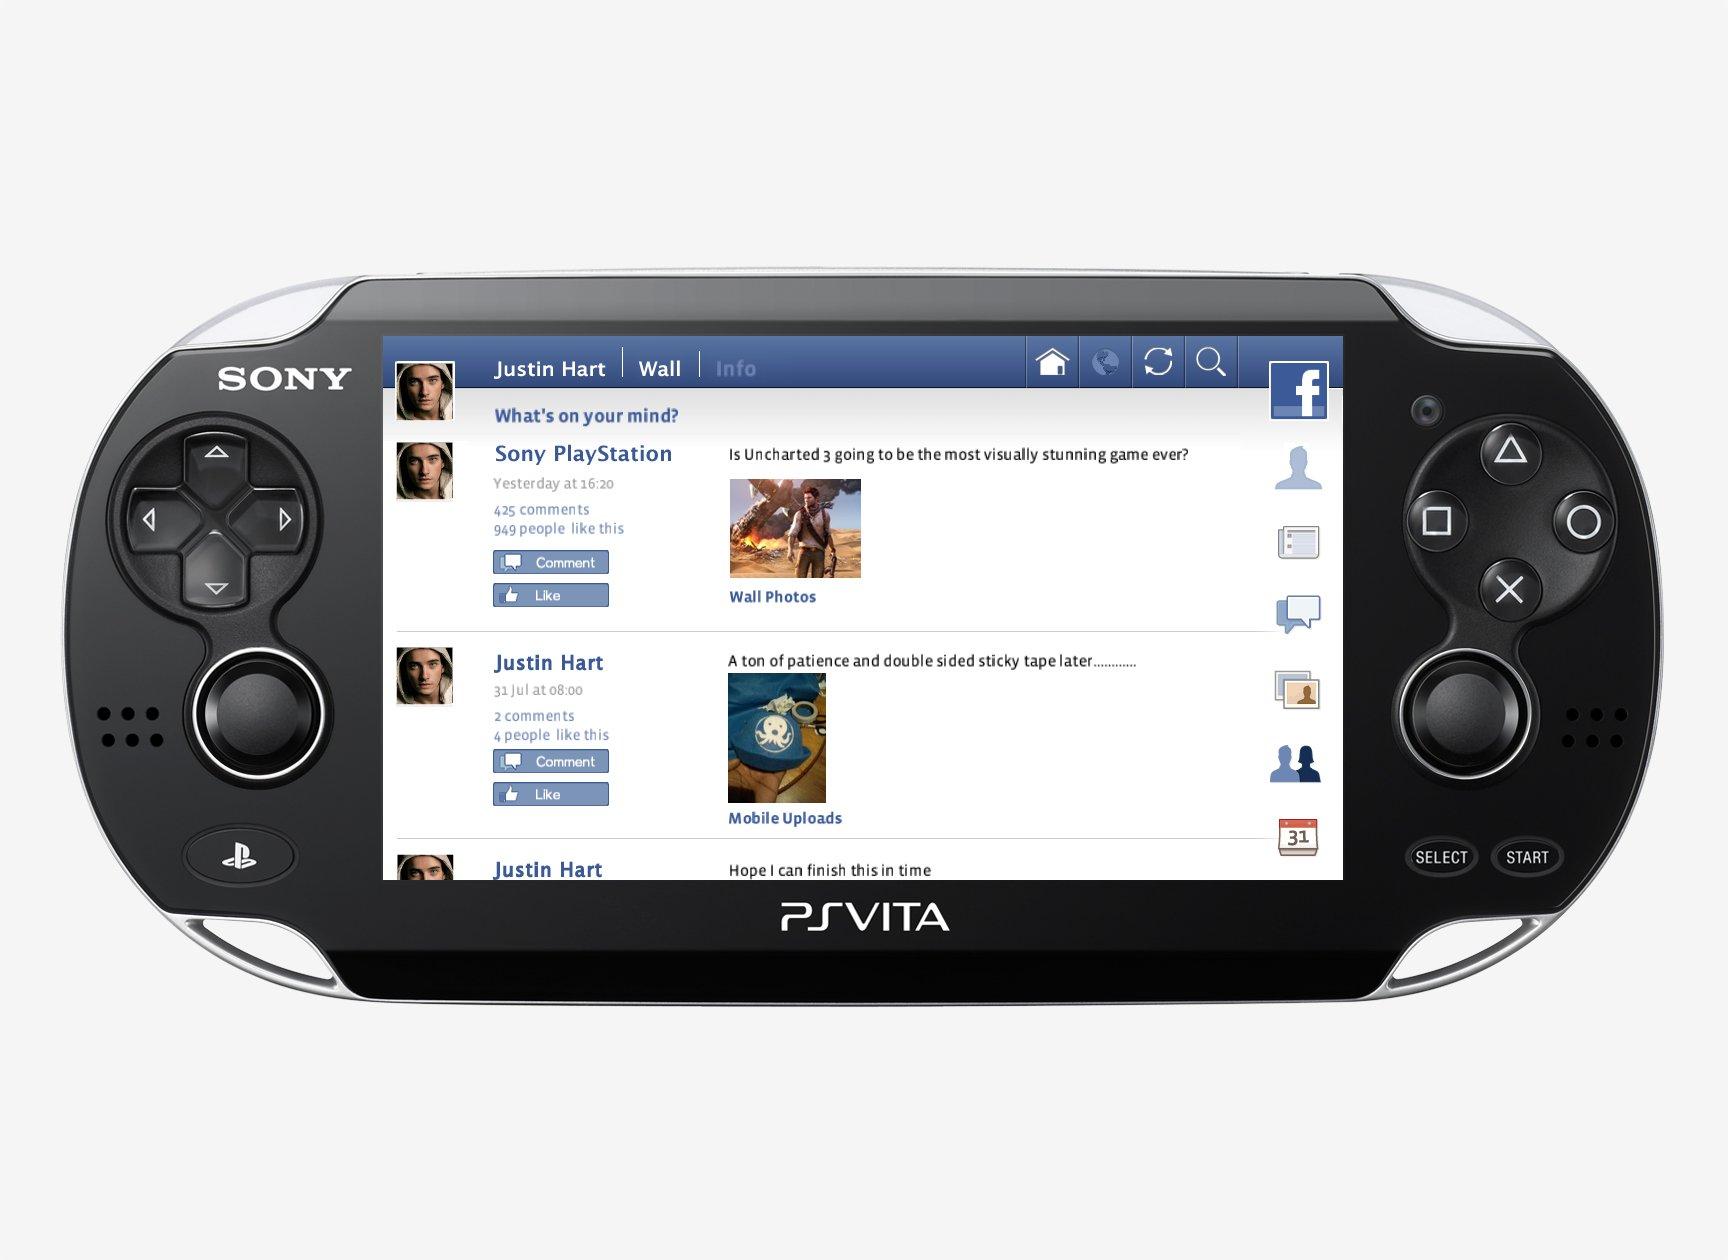 [Oficial] Guia PSB do PSVita PlayStation-Vita_2011_08-18-11_004